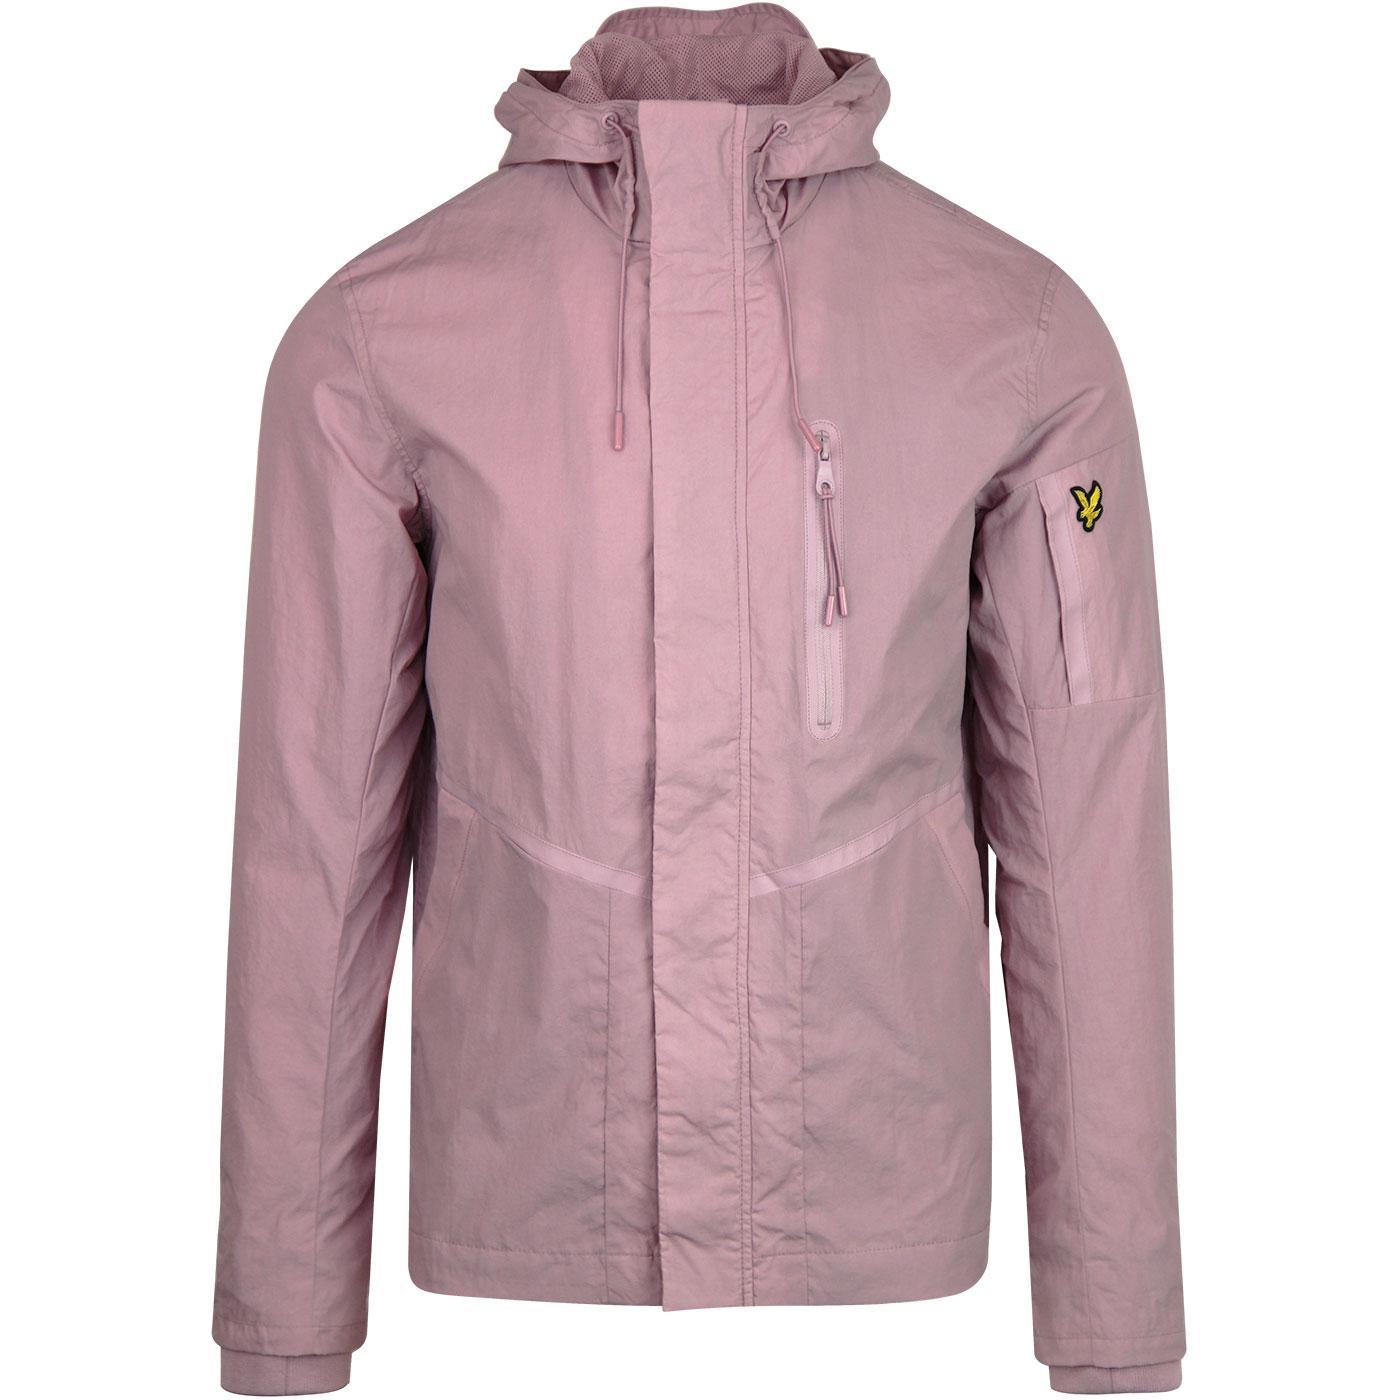 LYLE & SCOTT Retro 90s Minimal Hooded Jacket (LM)